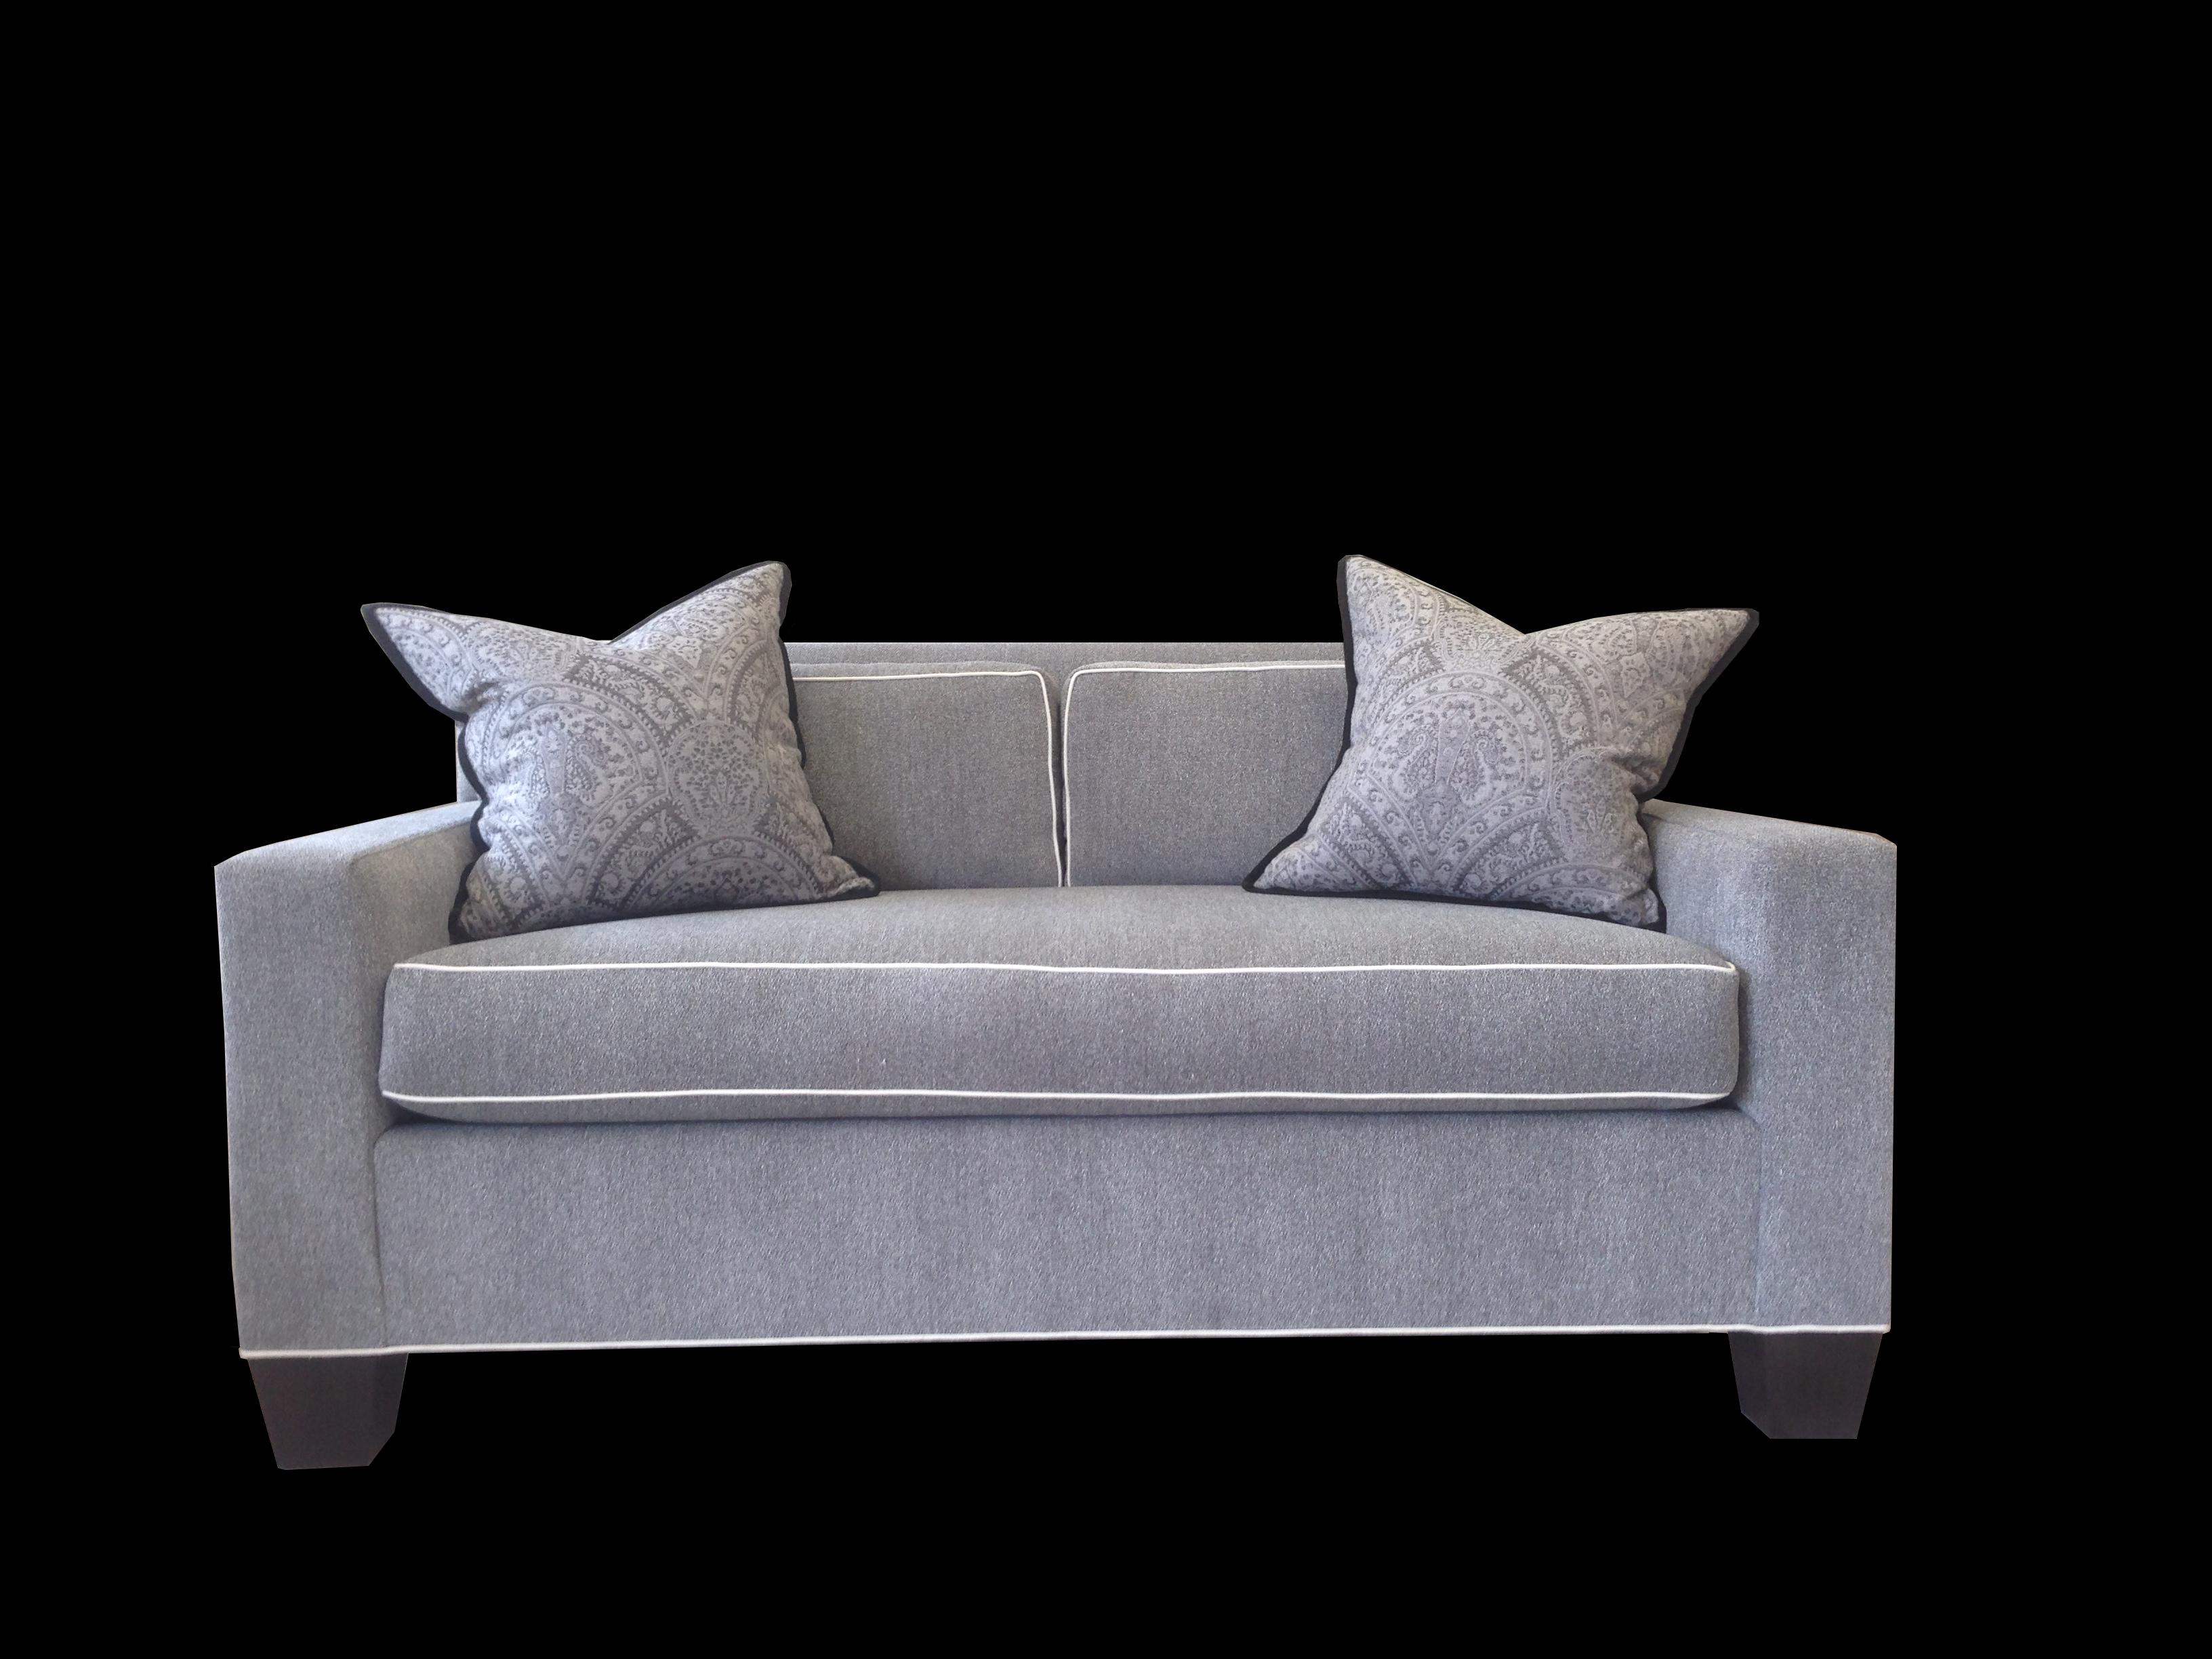 Stupendous Leilani Sofa Ibusinesslaw Wood Chair Design Ideas Ibusinesslaworg